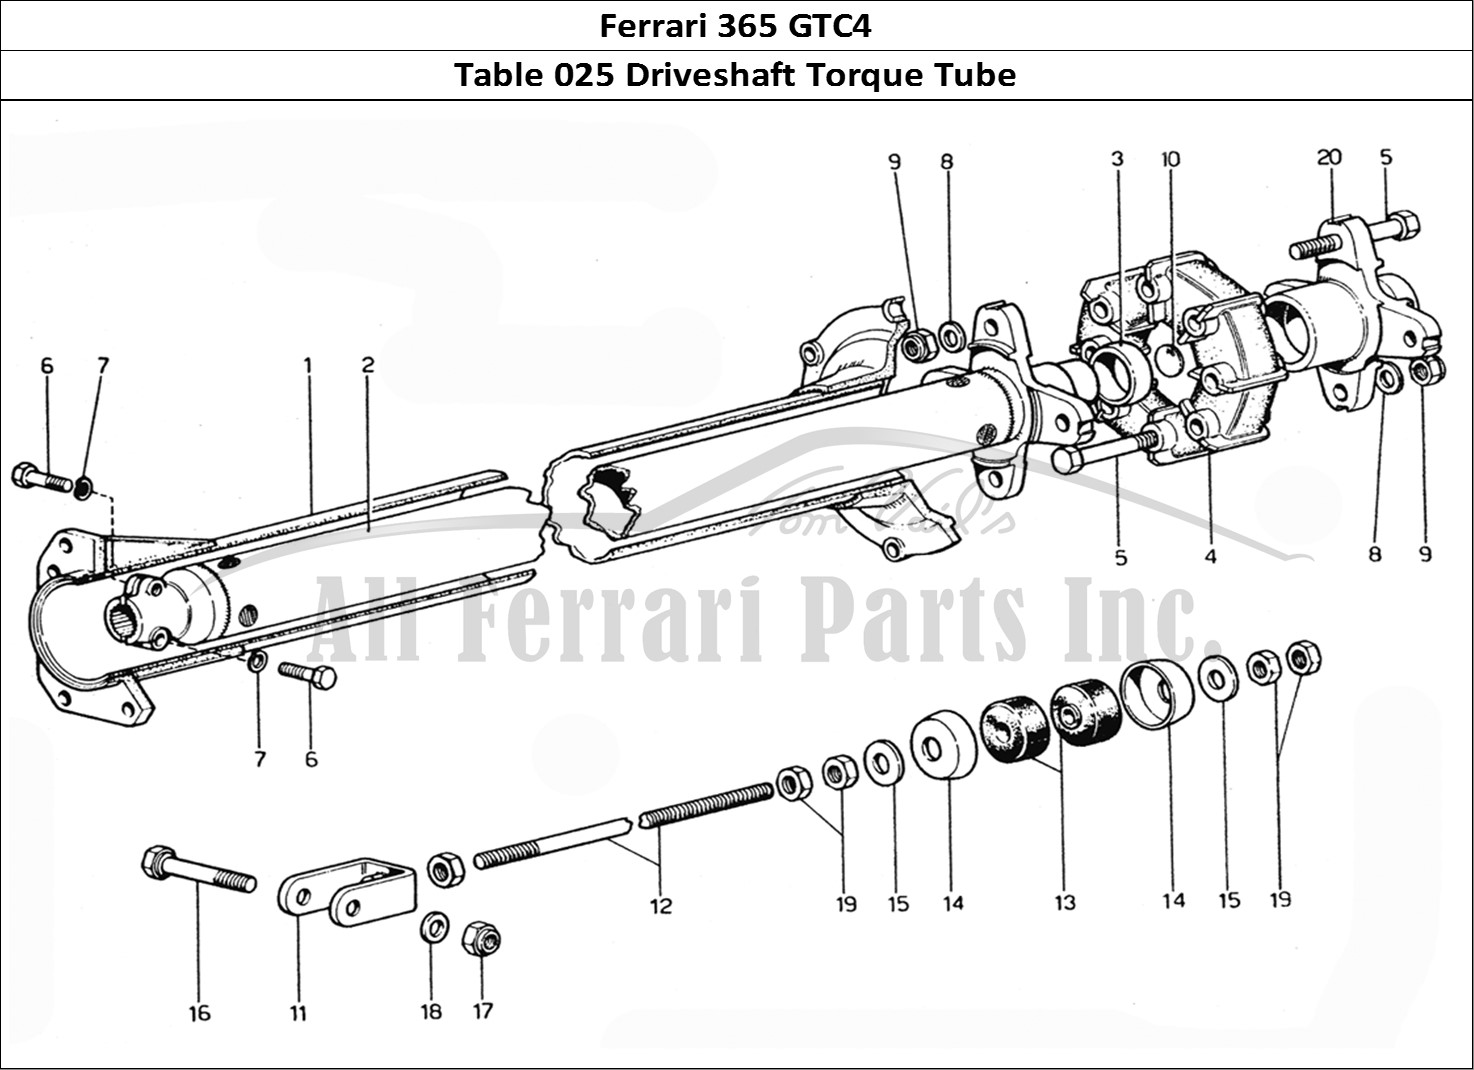 Buy Original Ferrari 365 Gtc4 025 Driveshaft Torque Tube